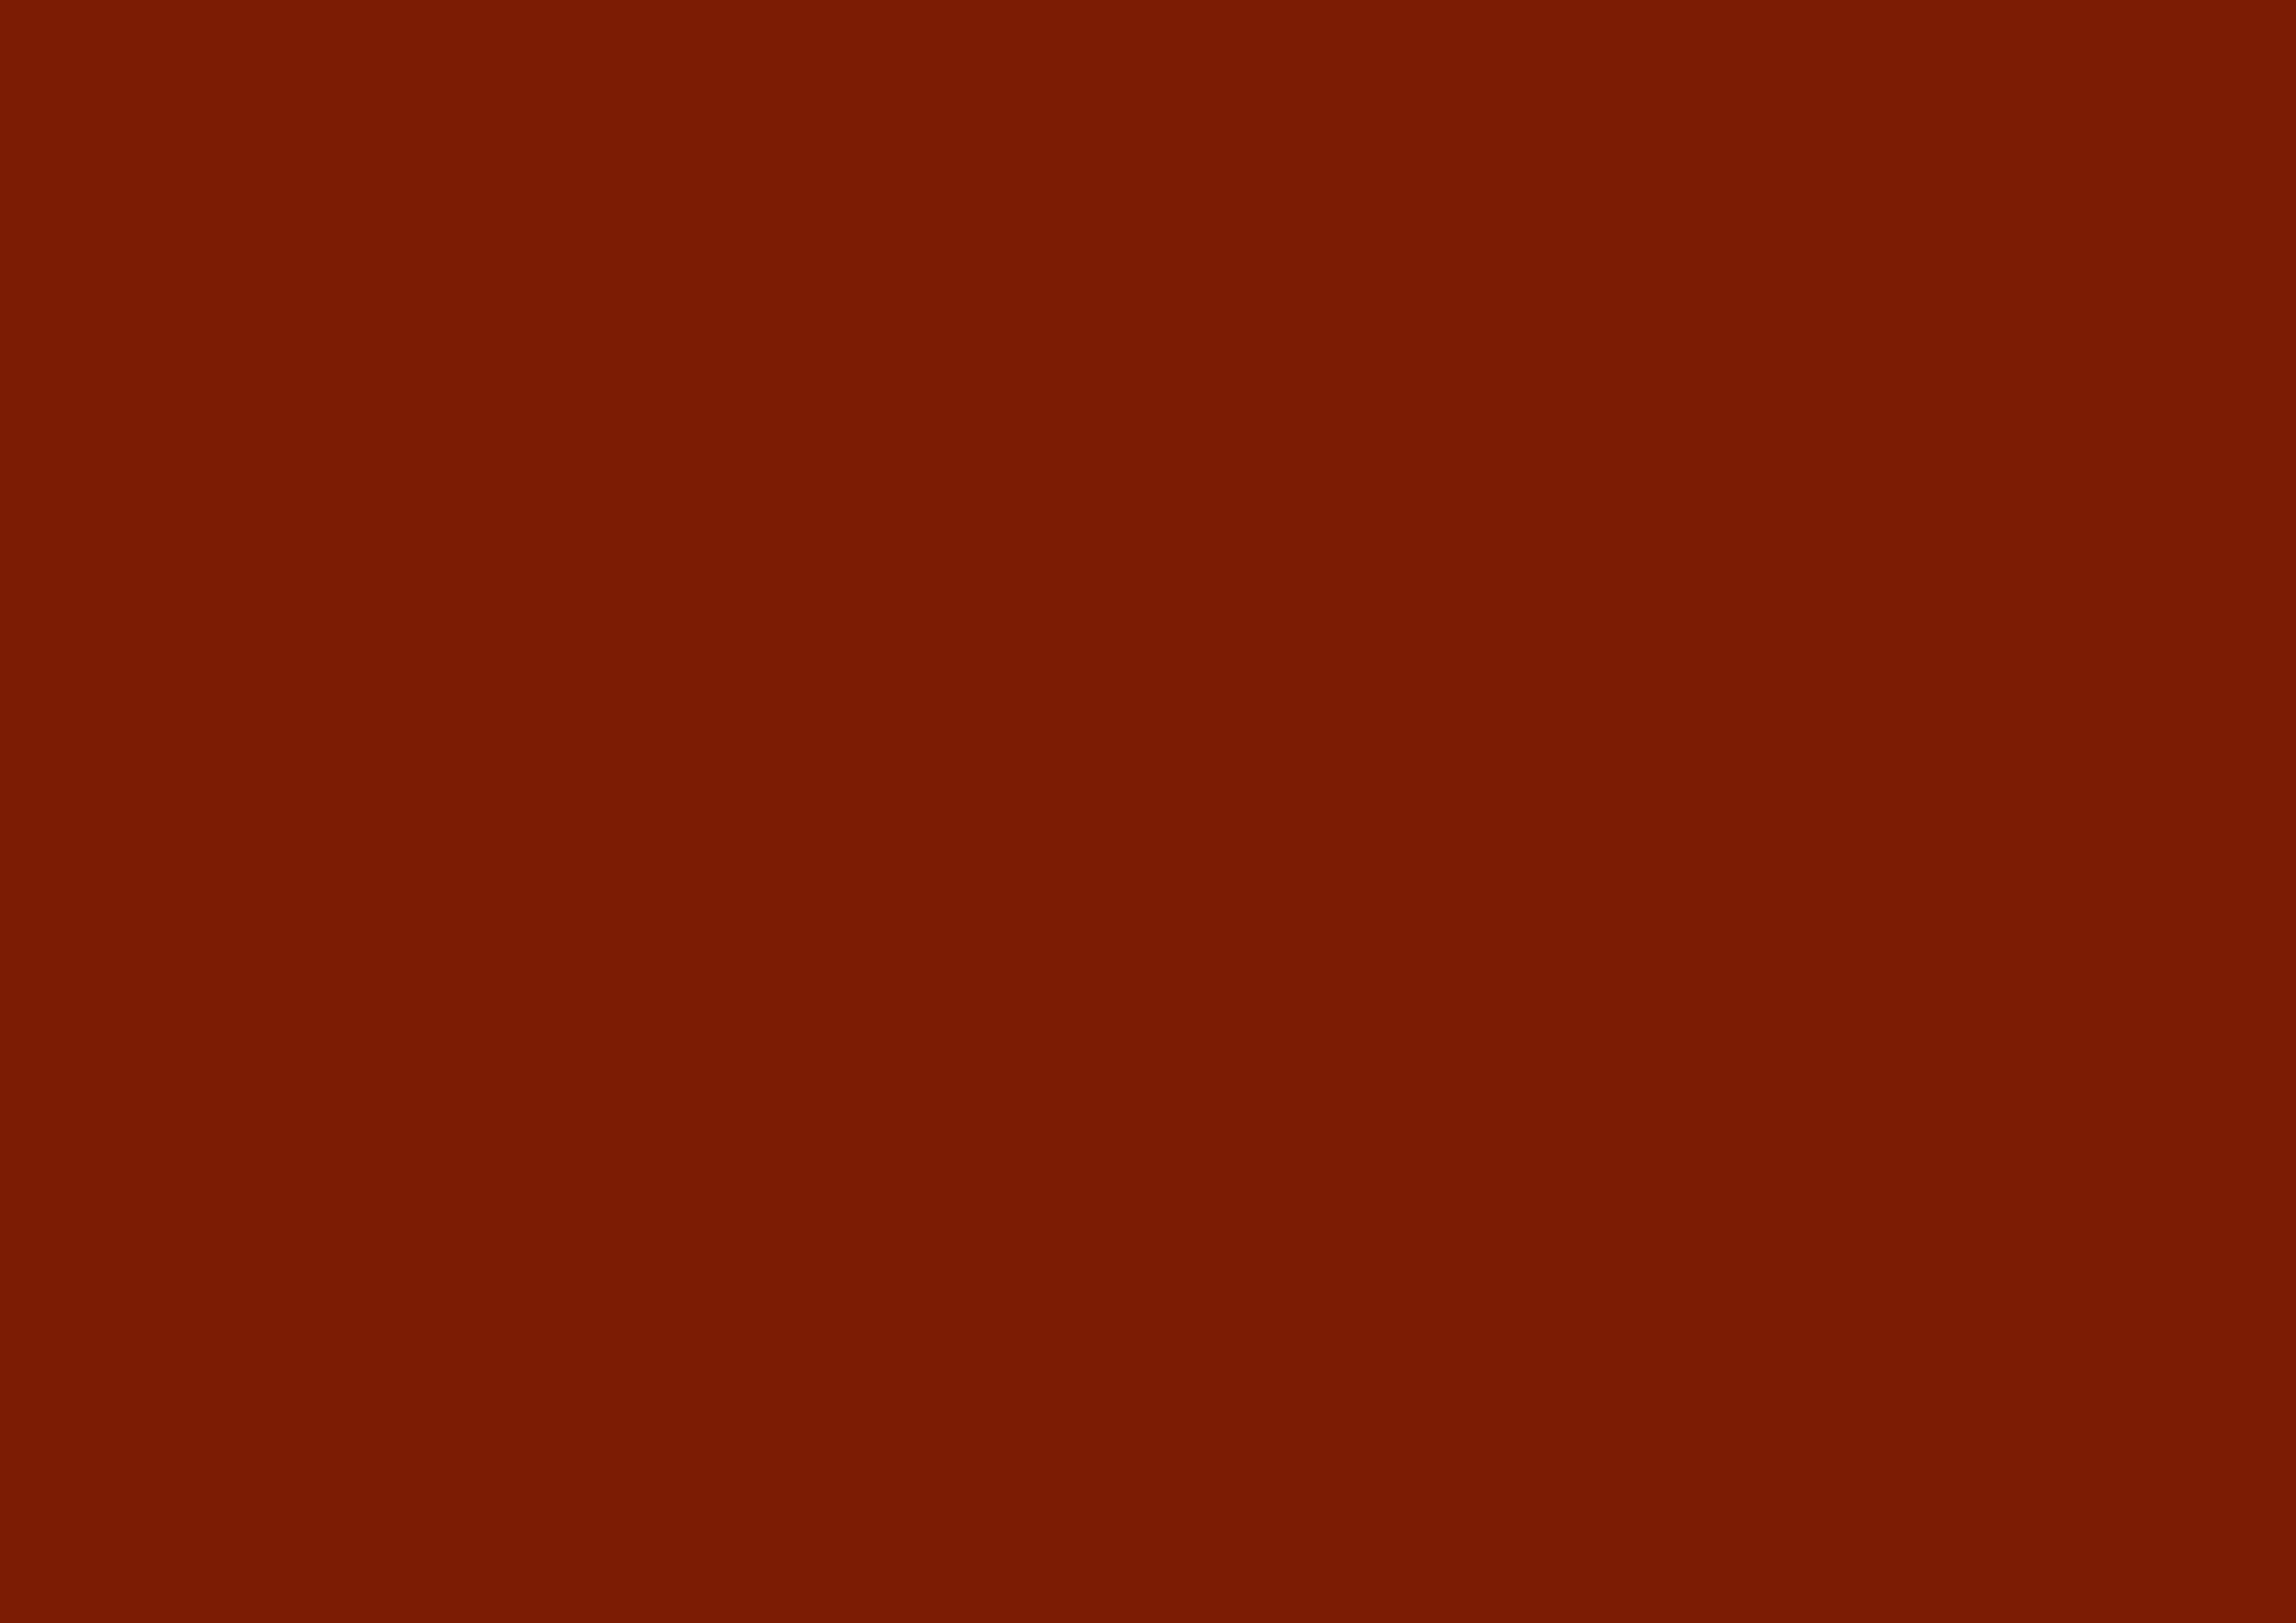 3508x2480 Kenyan Copper Solid Color Background